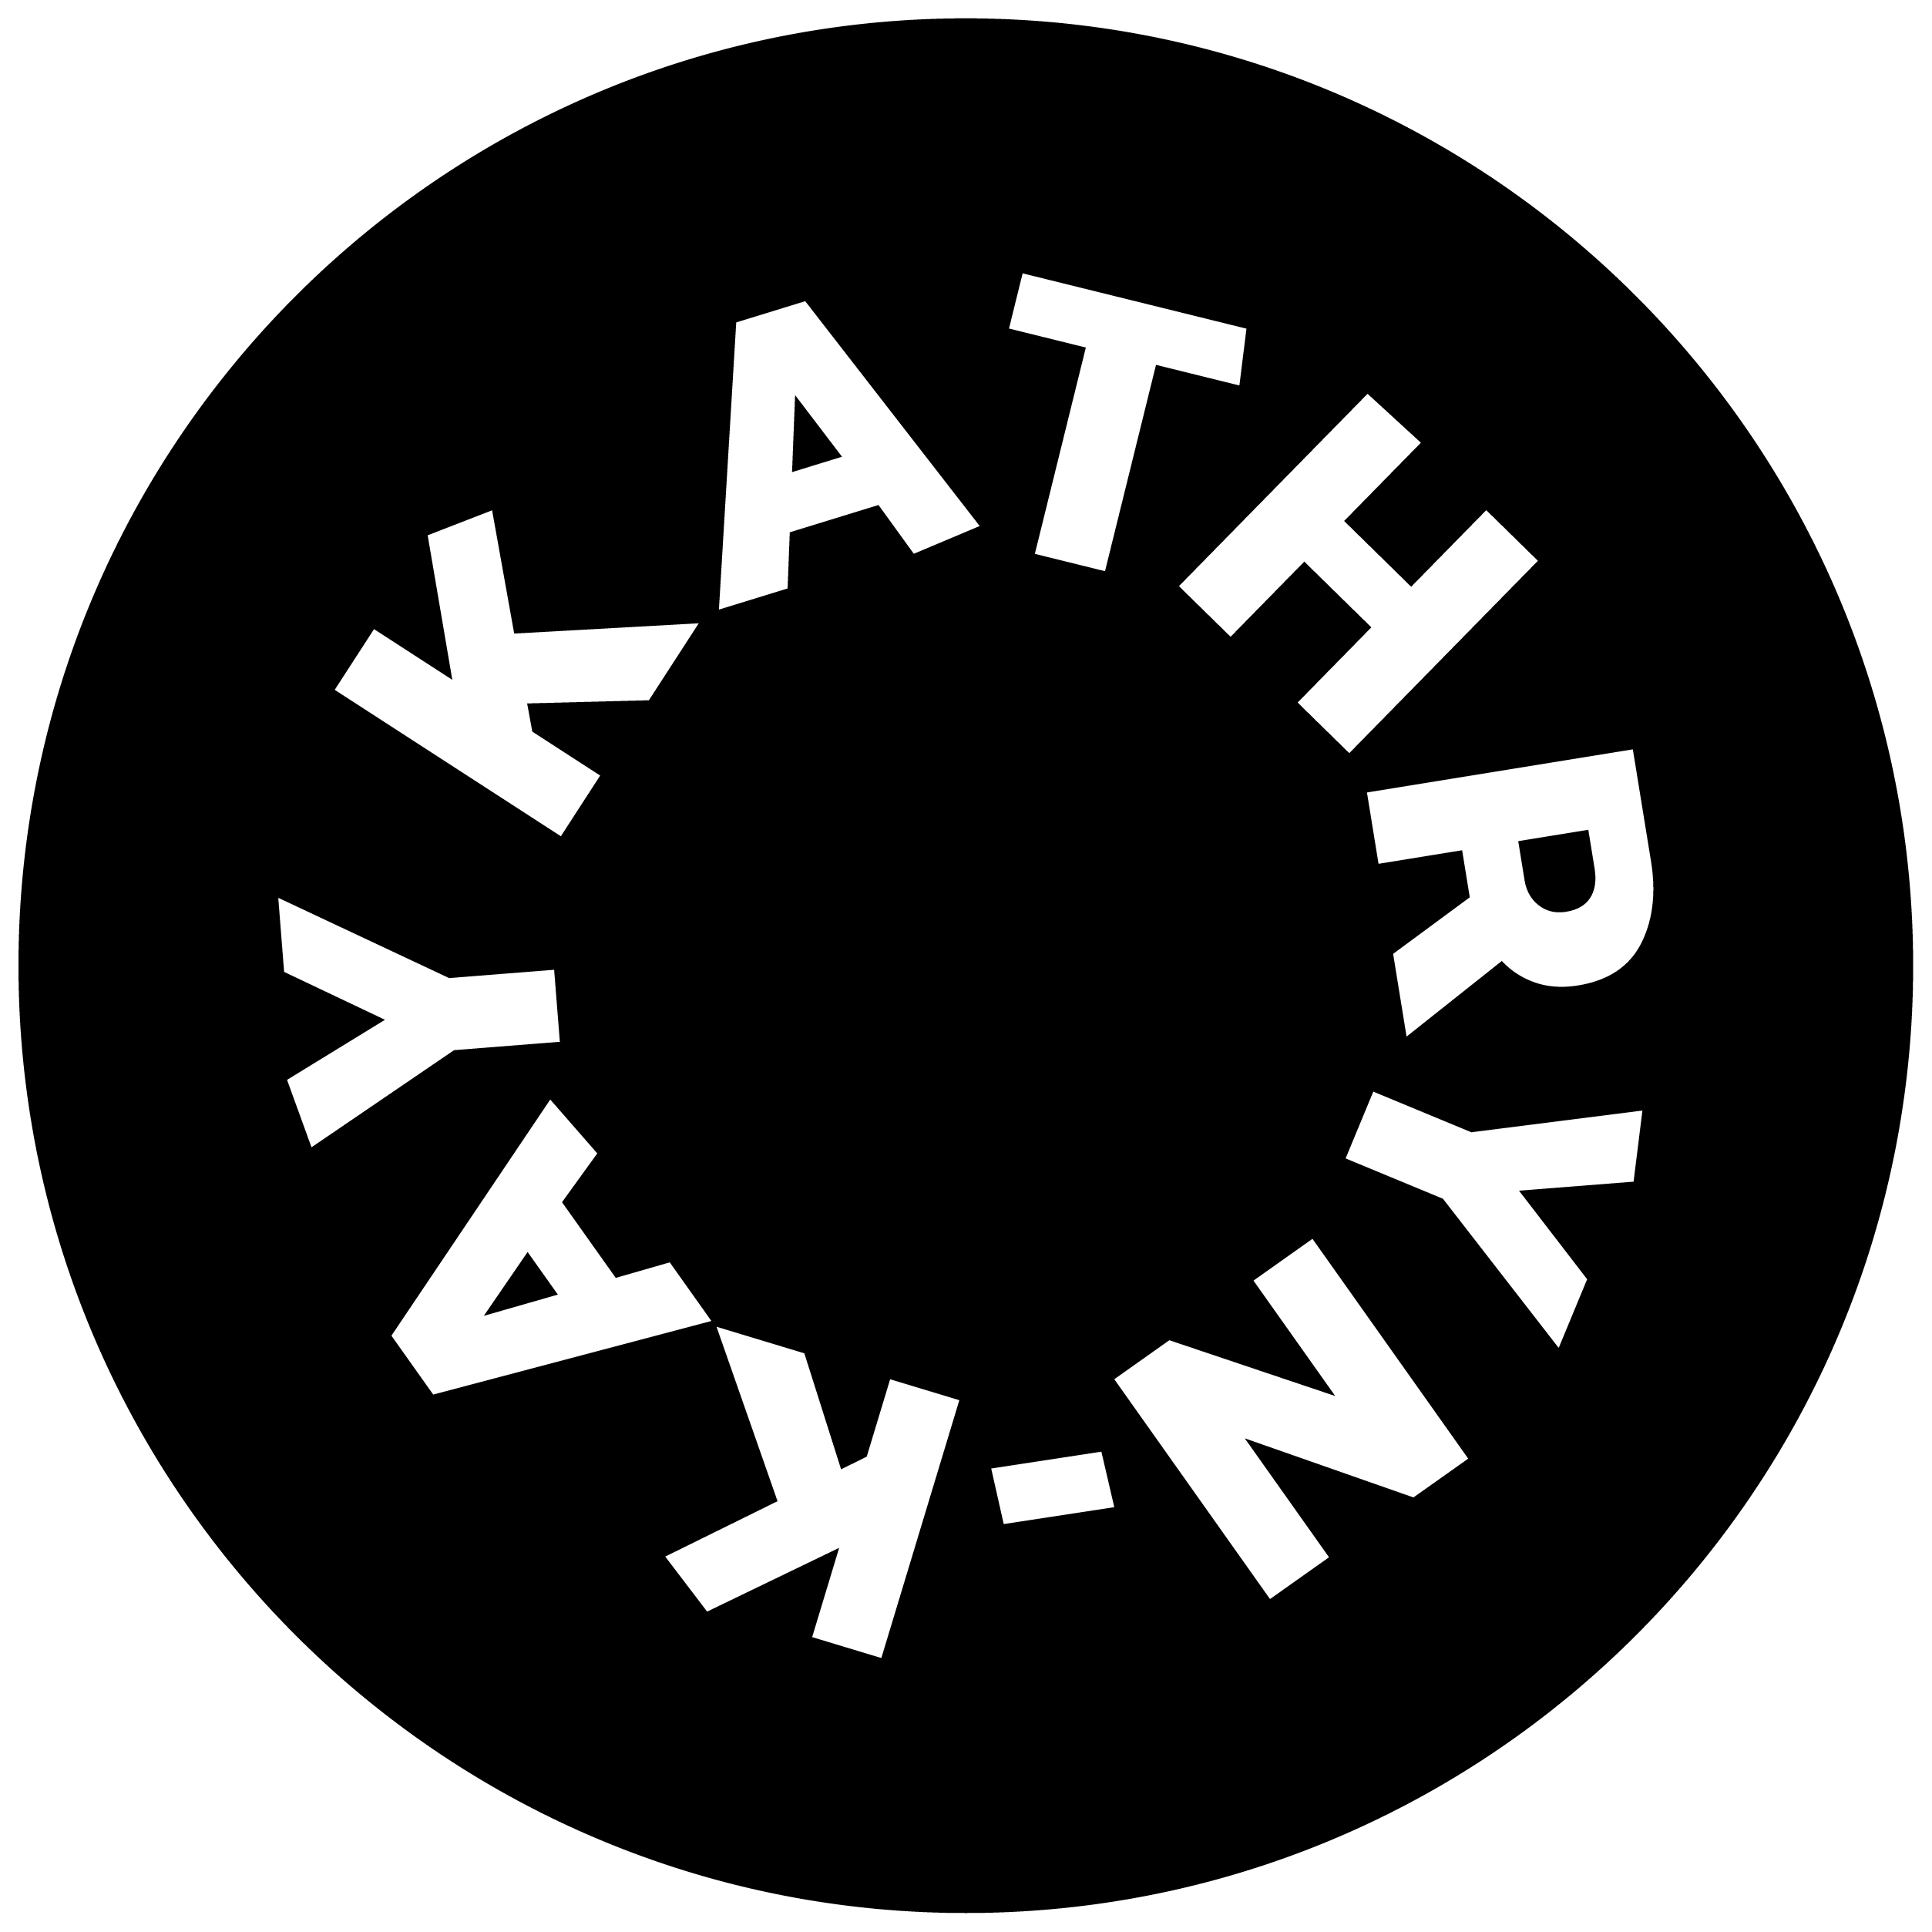 Kathryn-kay Johnson